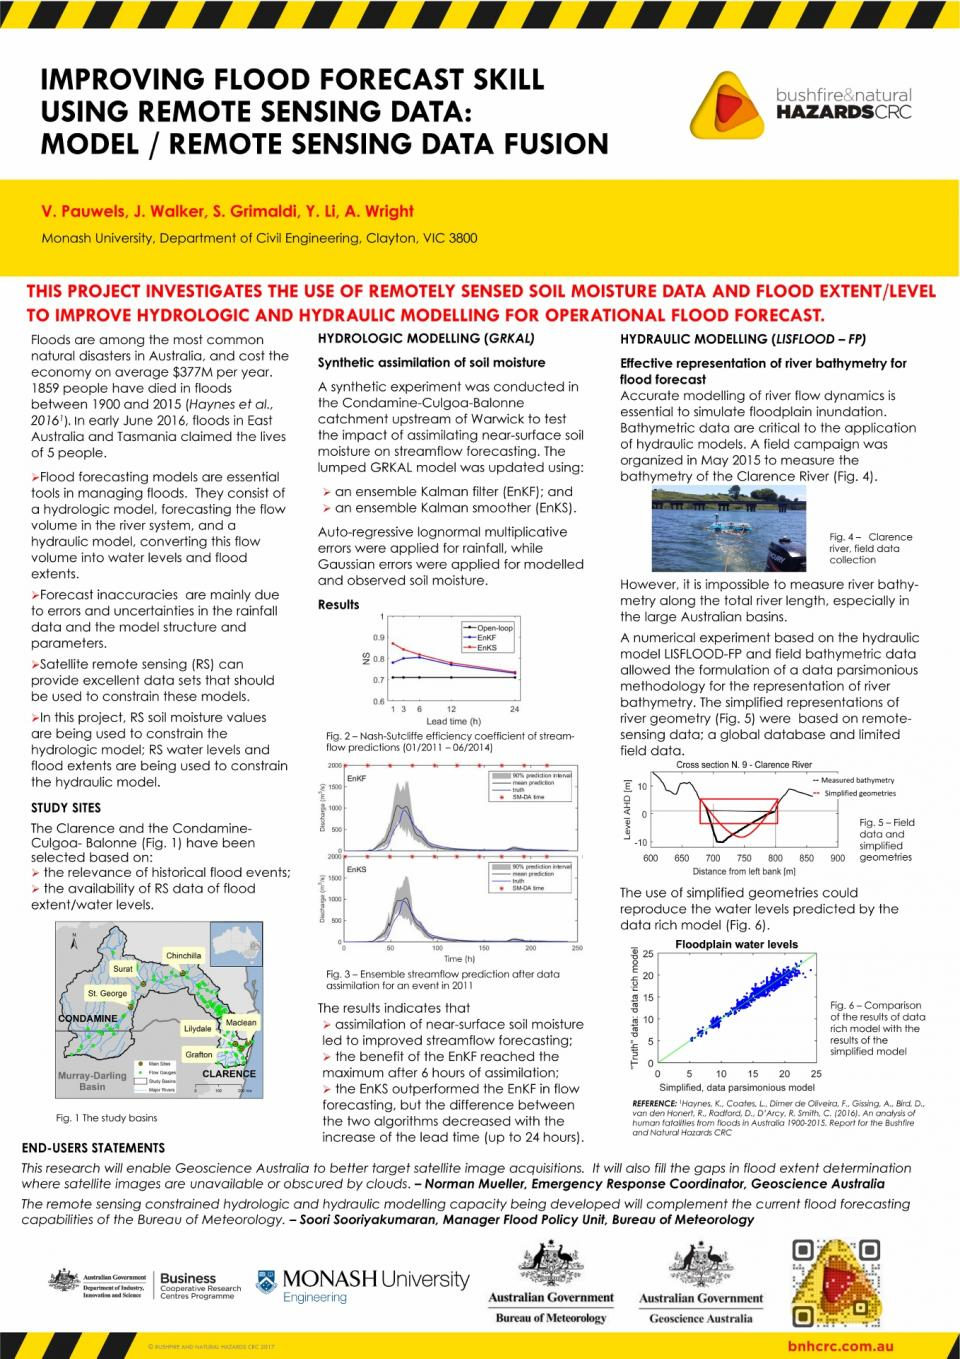 Improving flood forecast skill using remote sensing data: model/remote sensing data fusion